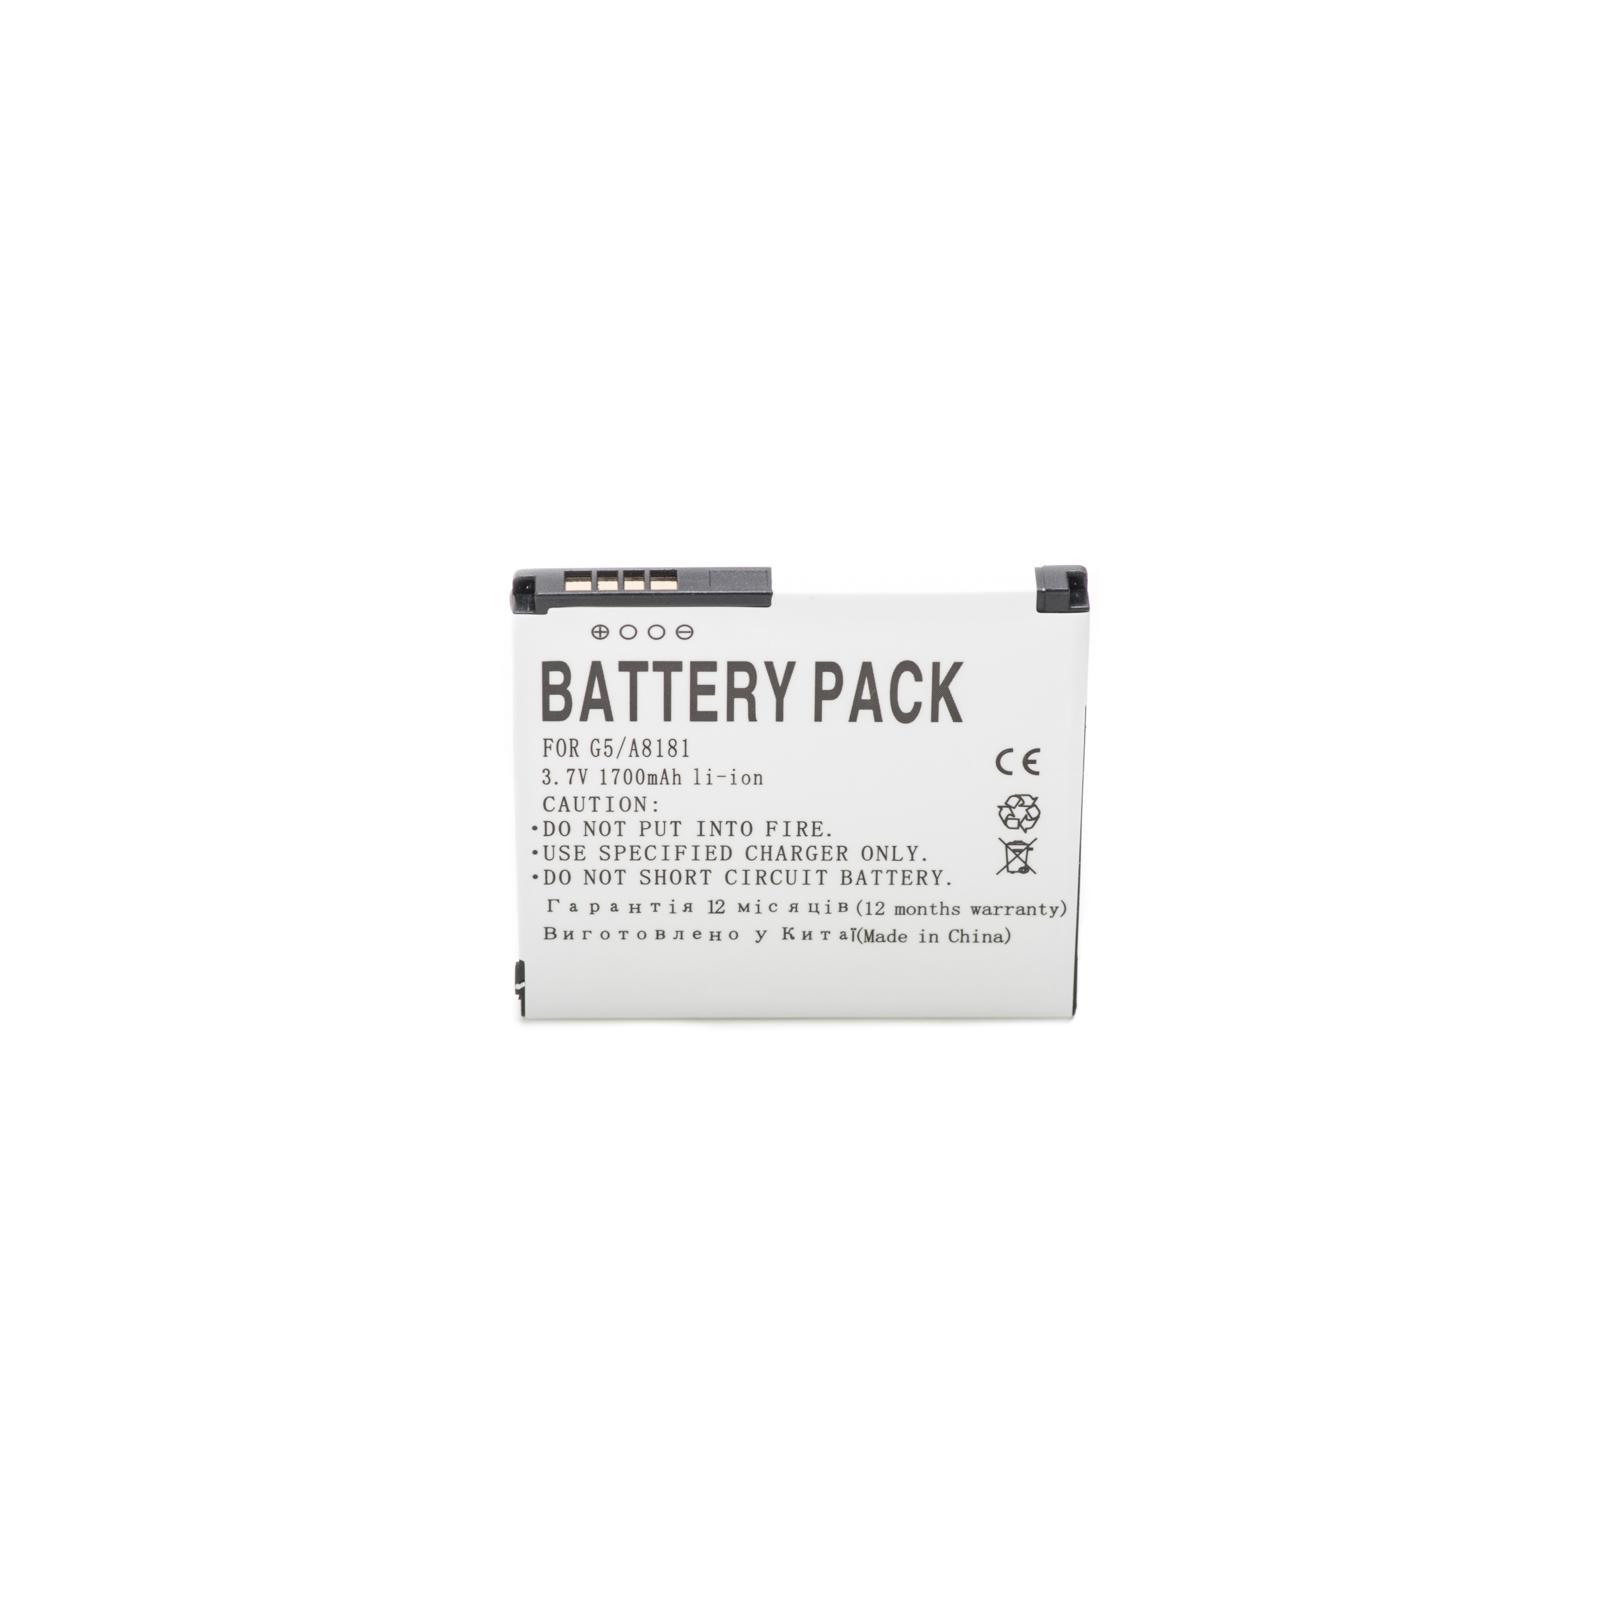 Аккумуляторная батарея PowerPlant HTC Desire (Bravo, A8181), Google Nexus One (DV00DV6055)